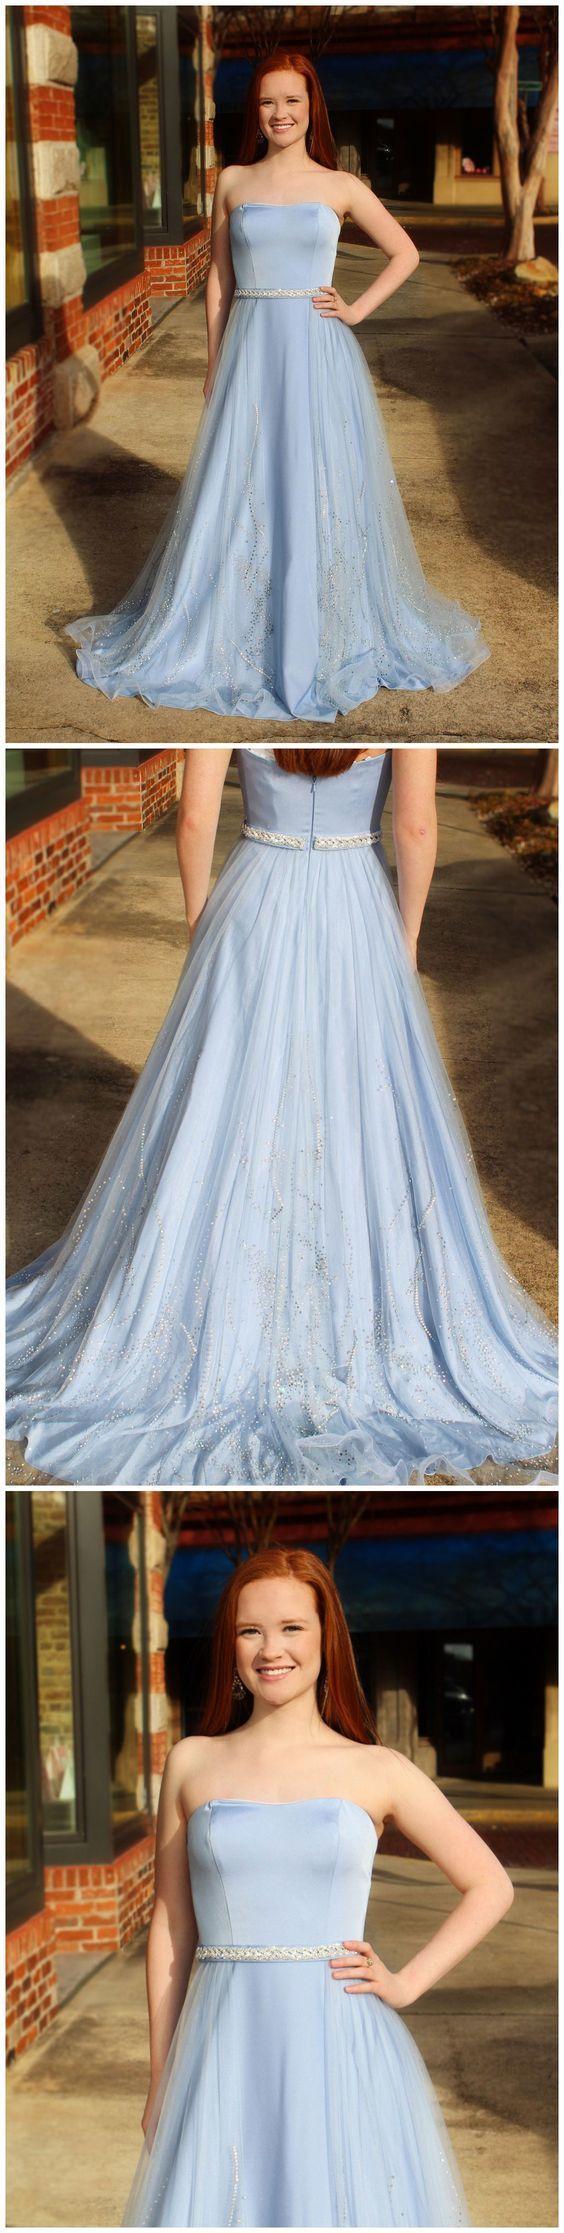 Elegant Satin Strapless Neckline A-line Prom Dresses With Beadings